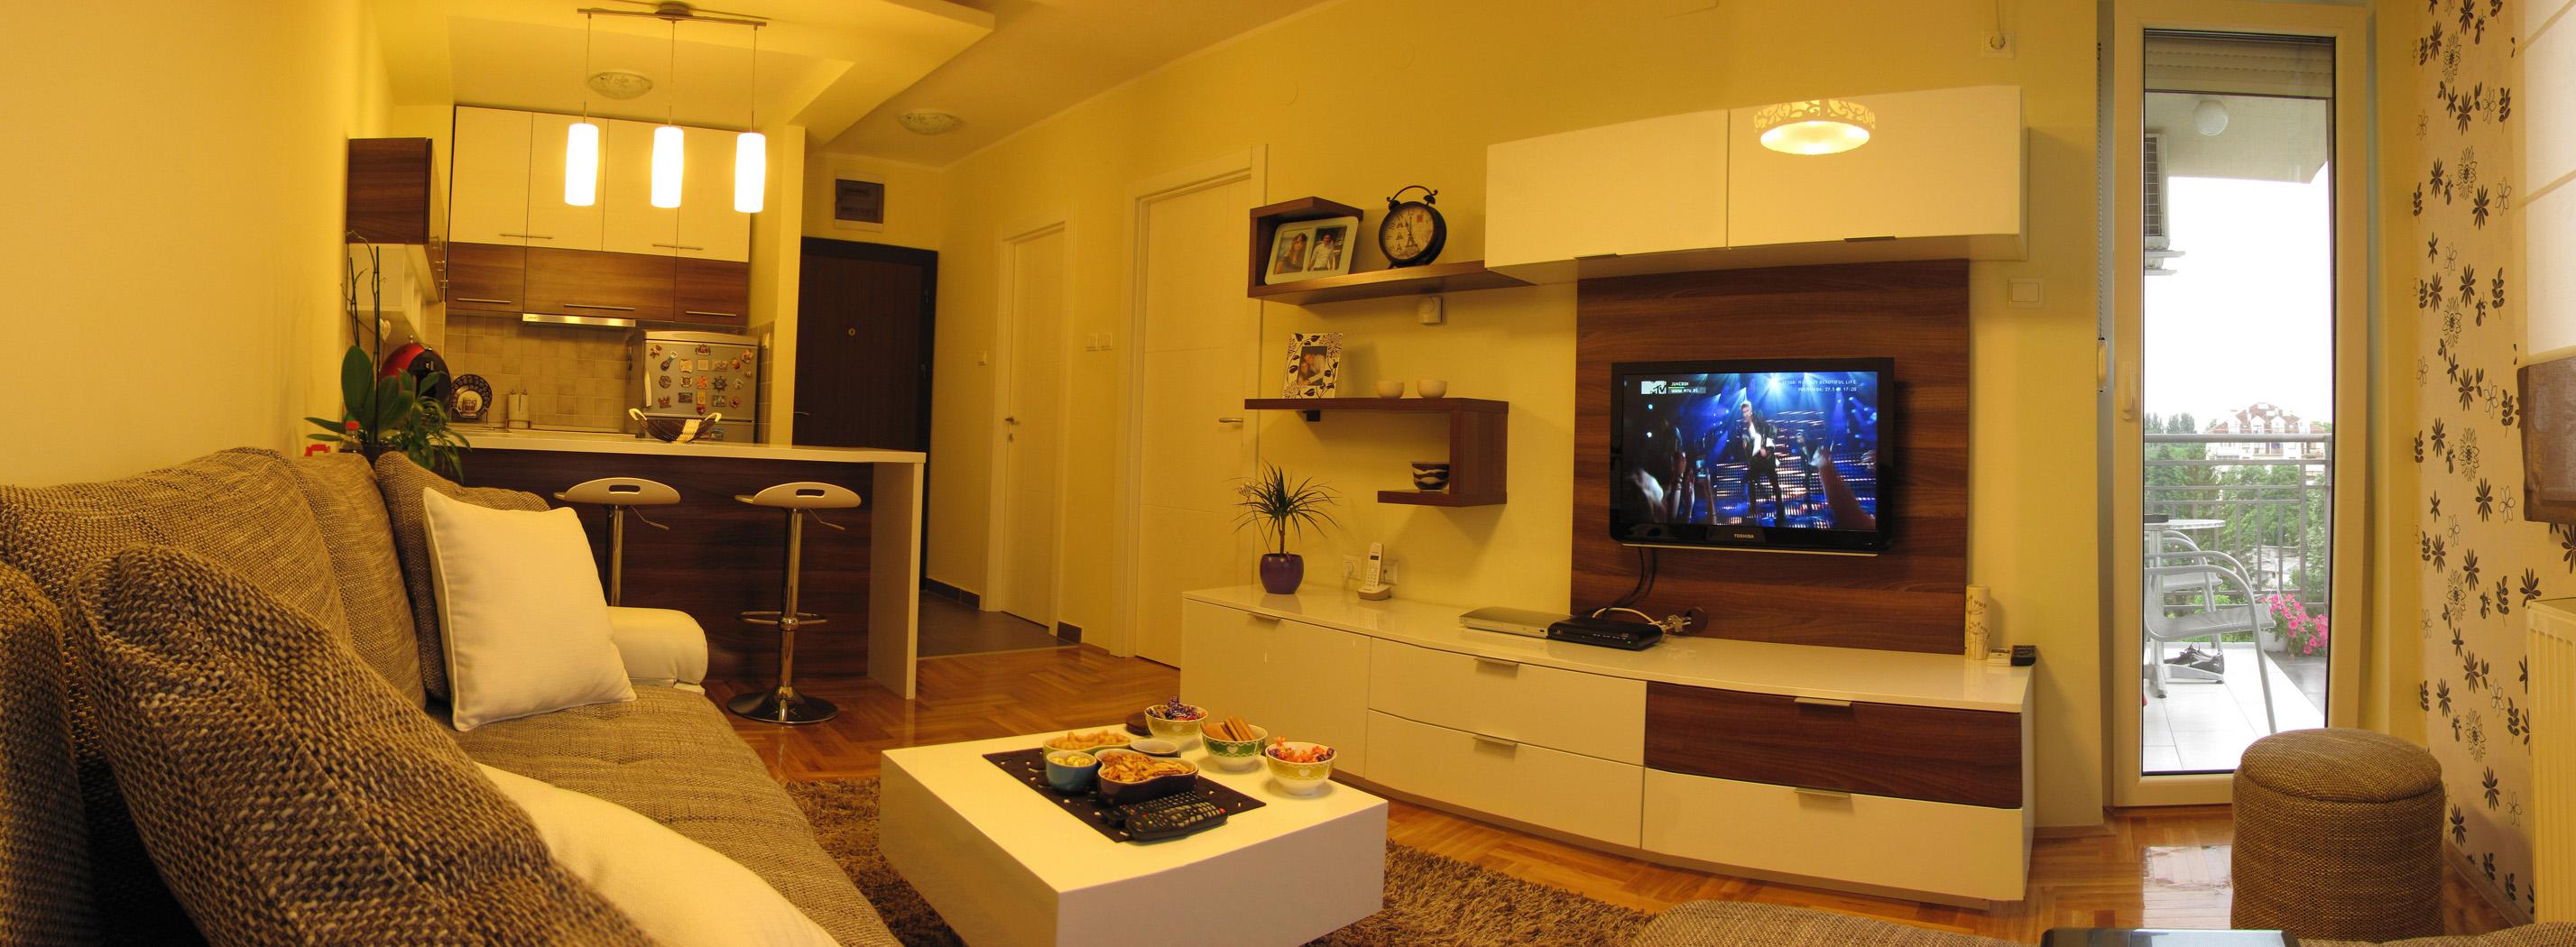 0028_LIVING ROOM